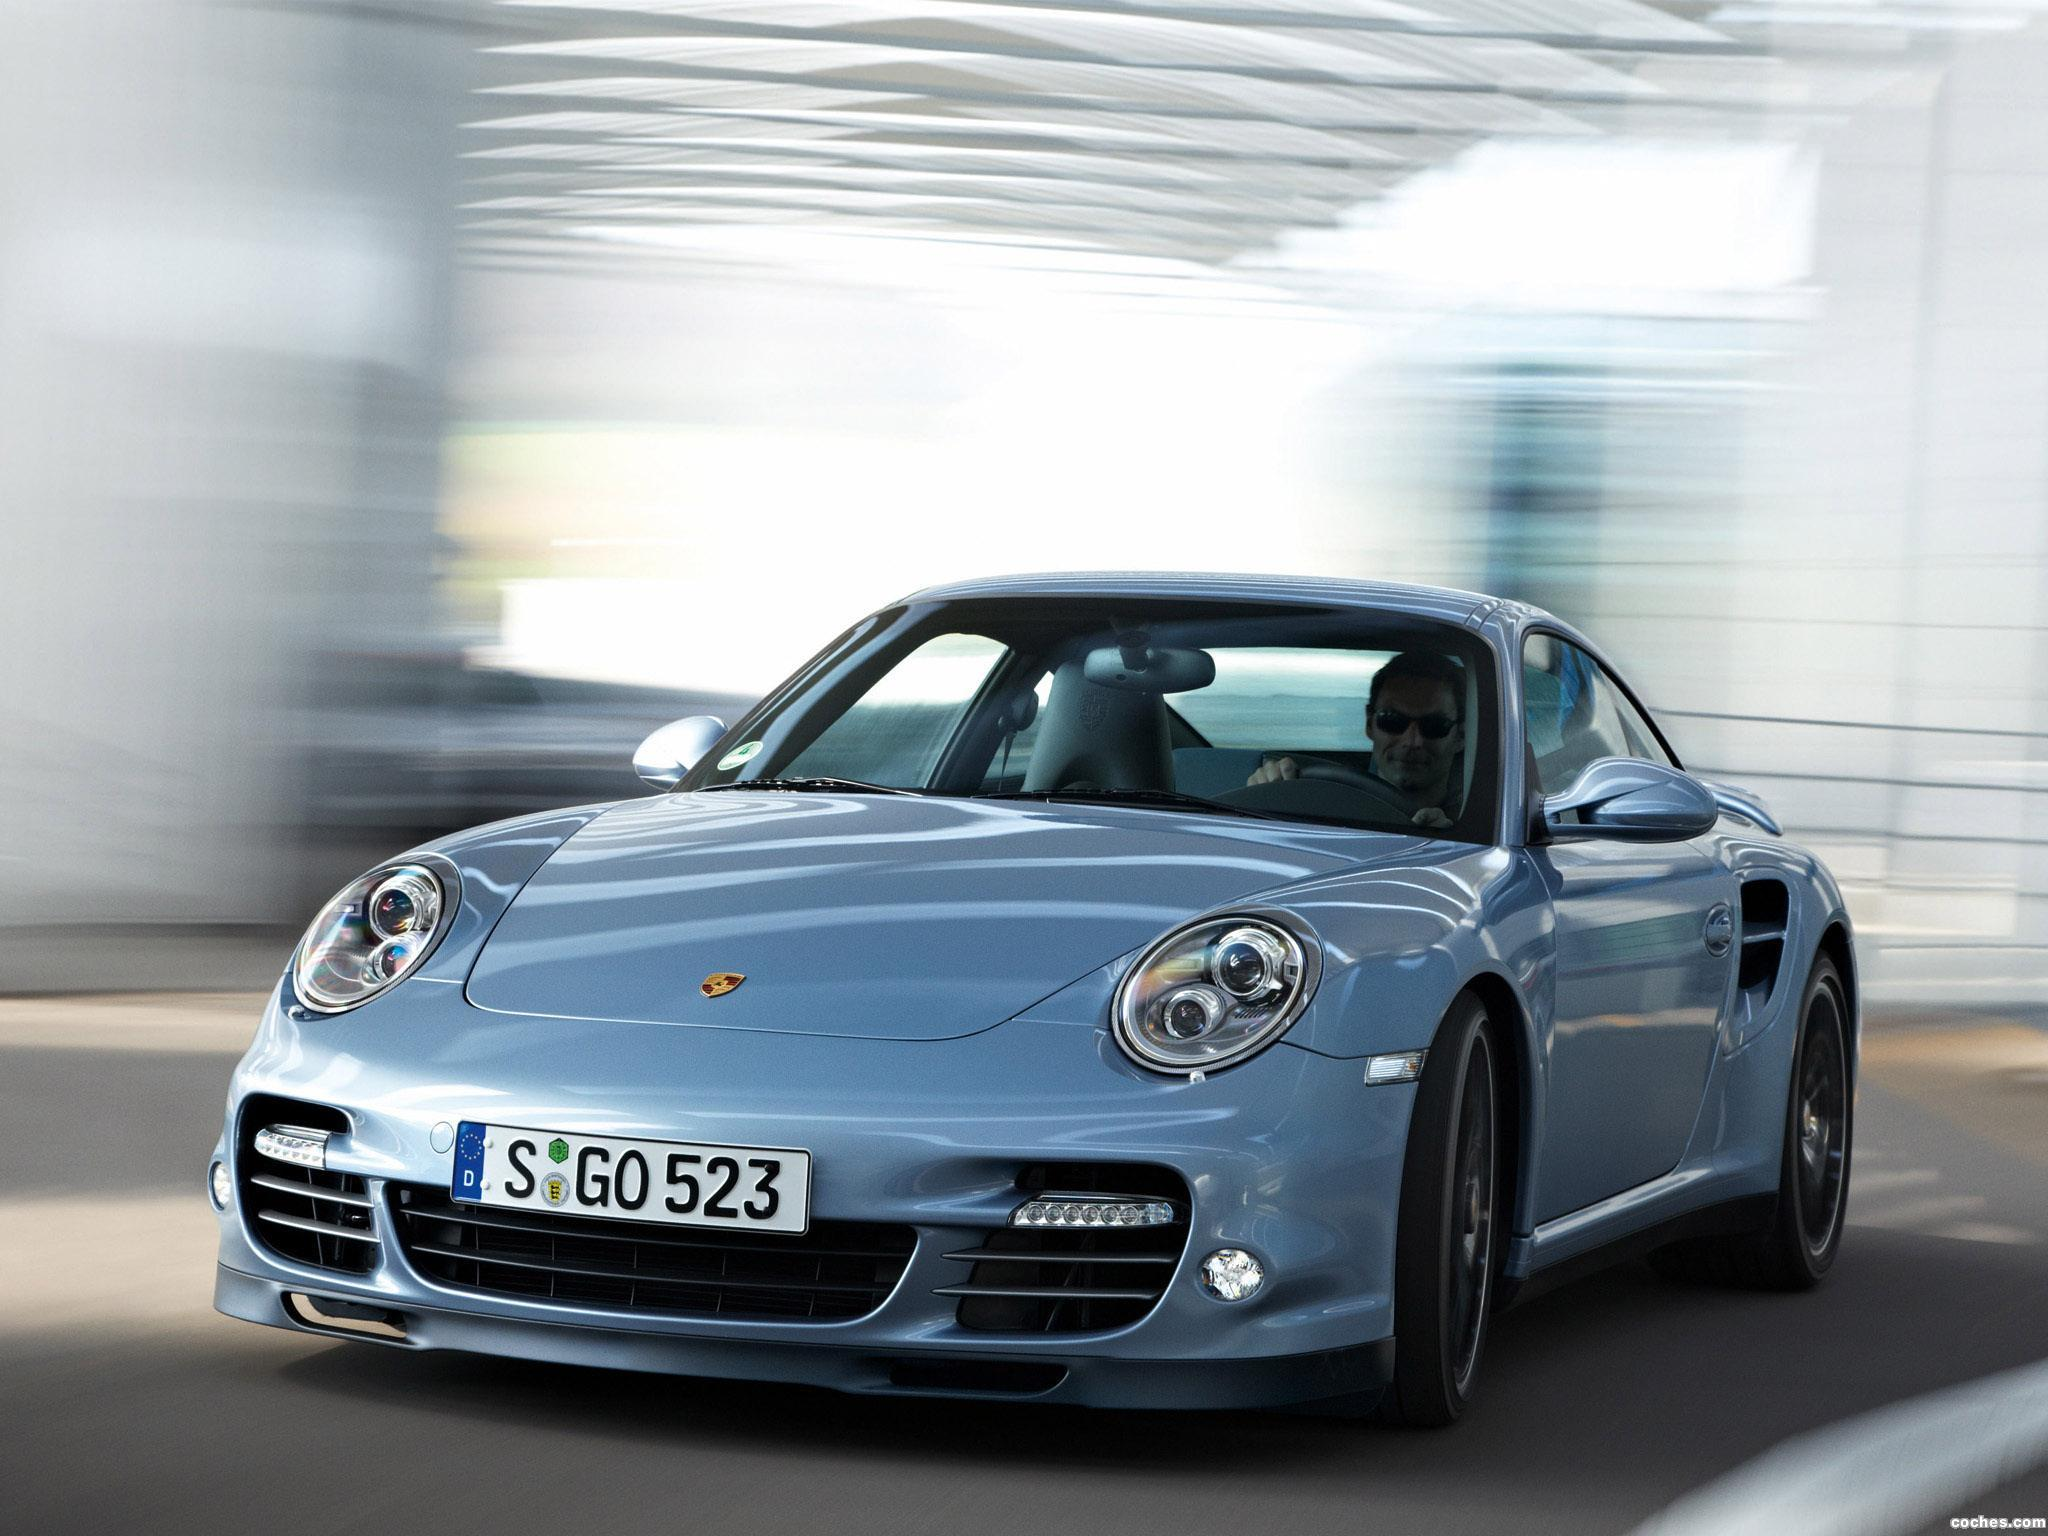 Foto 0 de Porsche 911 Turbo-S 997 2010